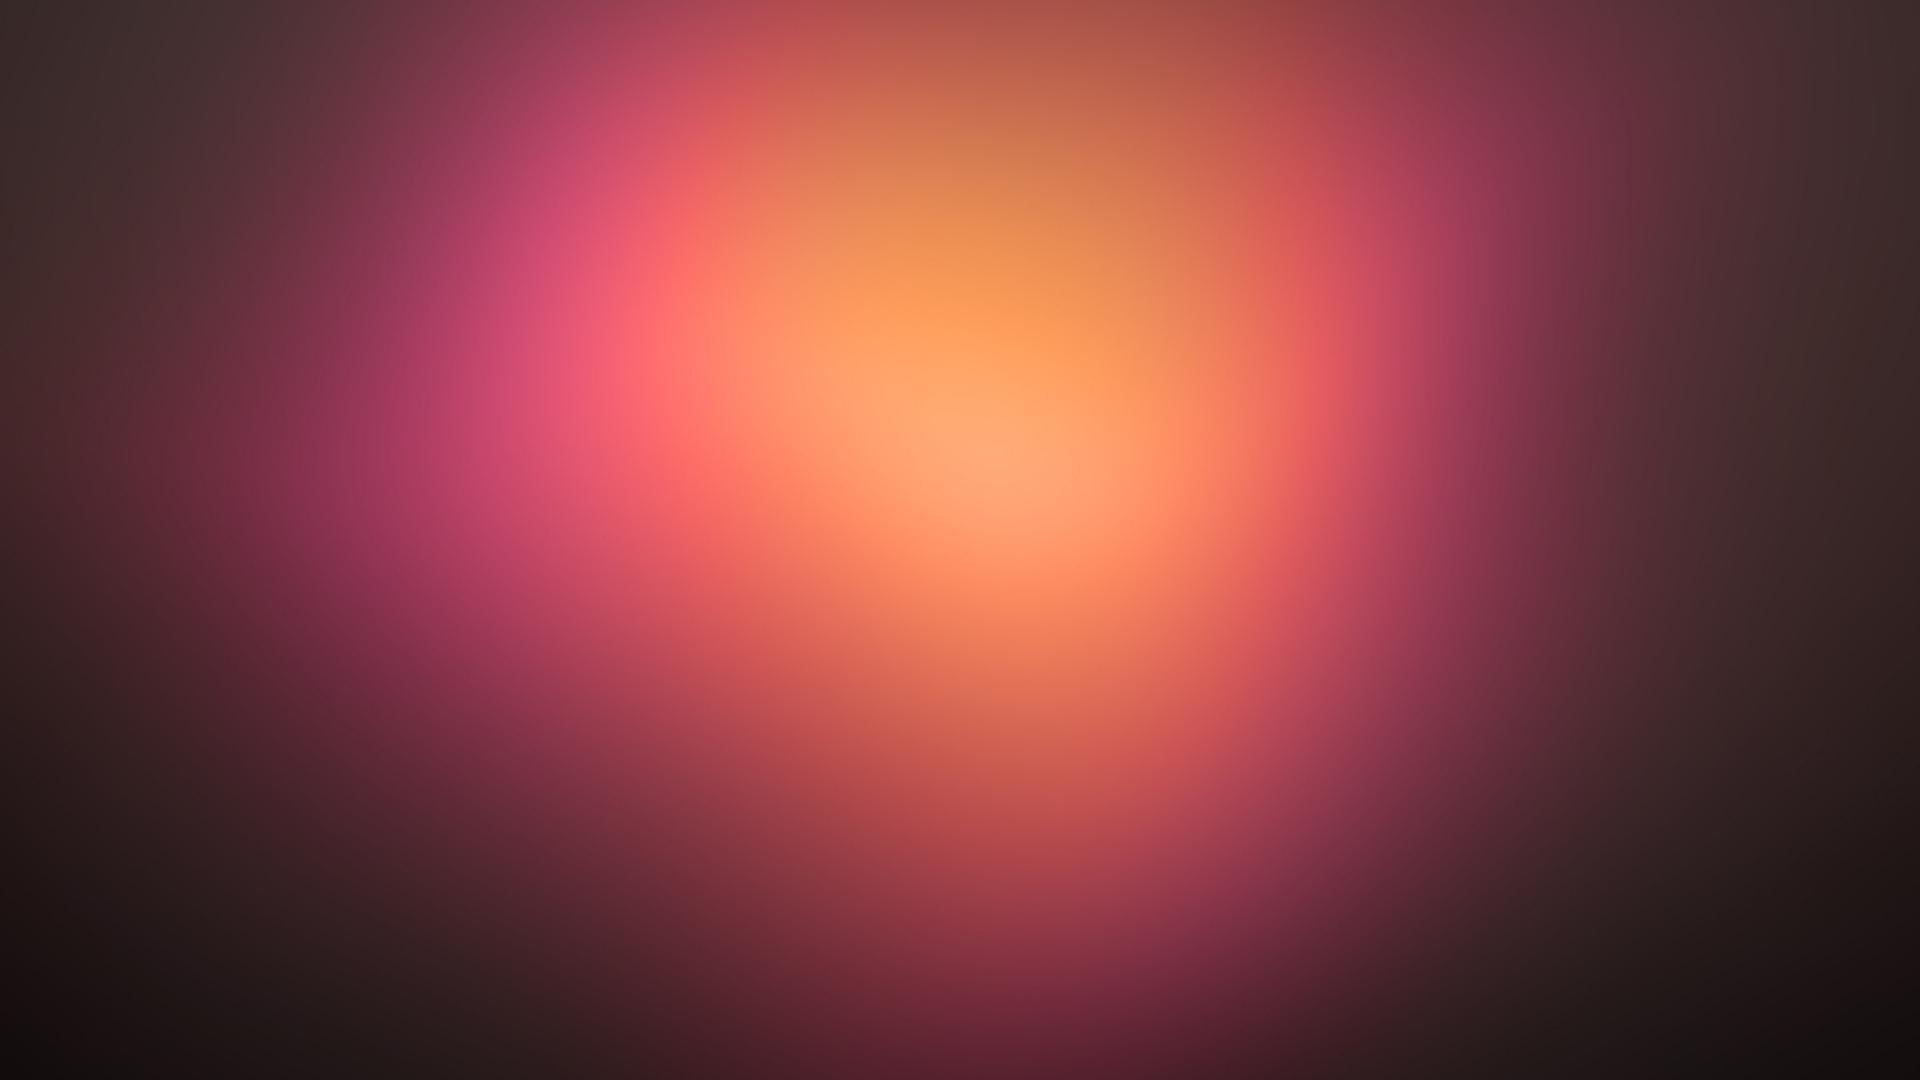 Blur image hd